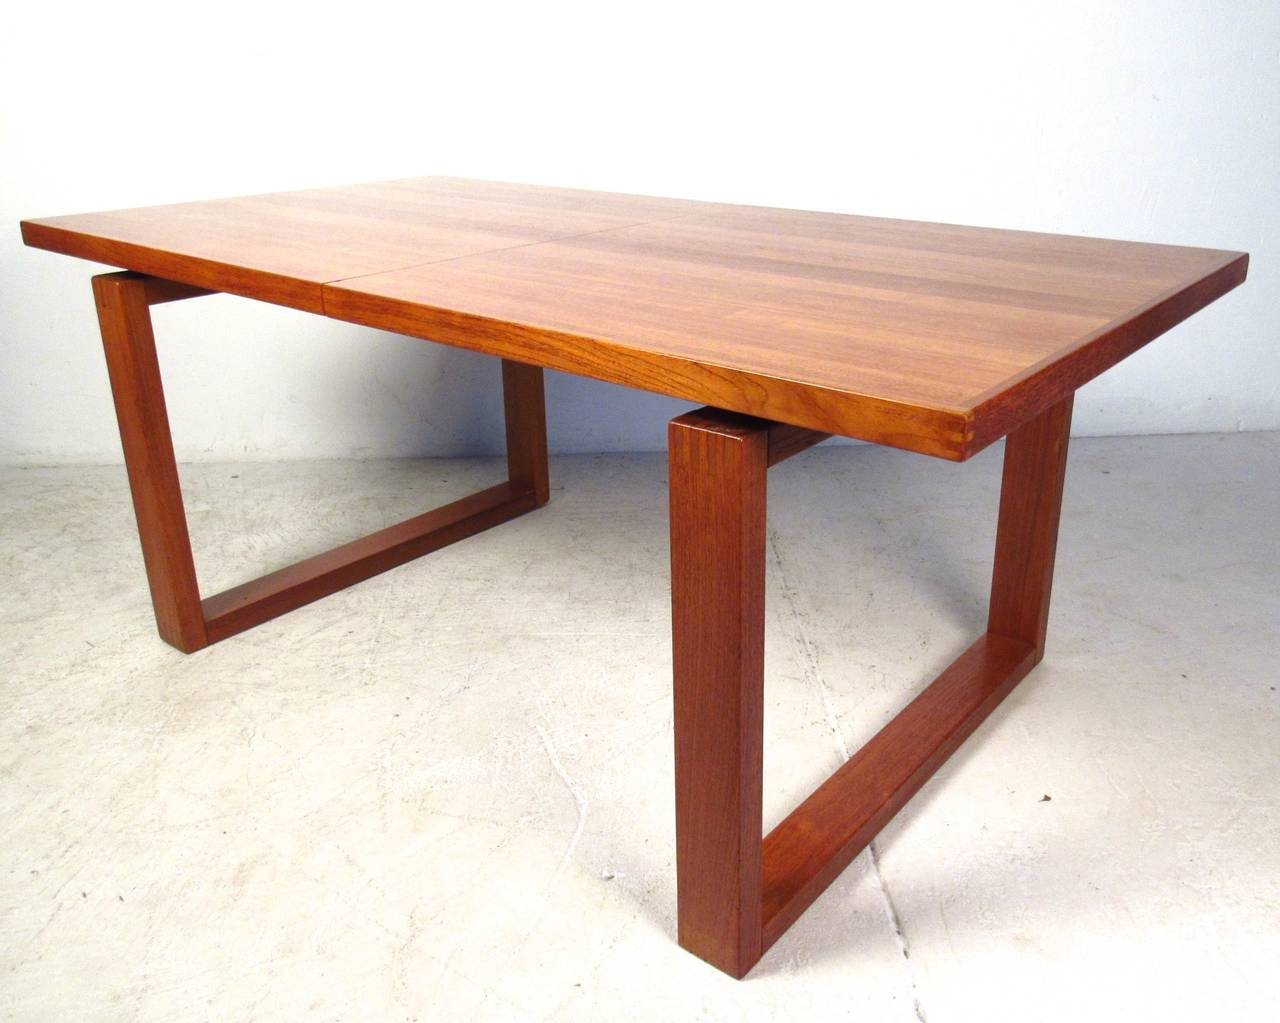 Unique danish teak sled leg dining table for sale at 1stdibs - Unique kitchen tables for sale ...